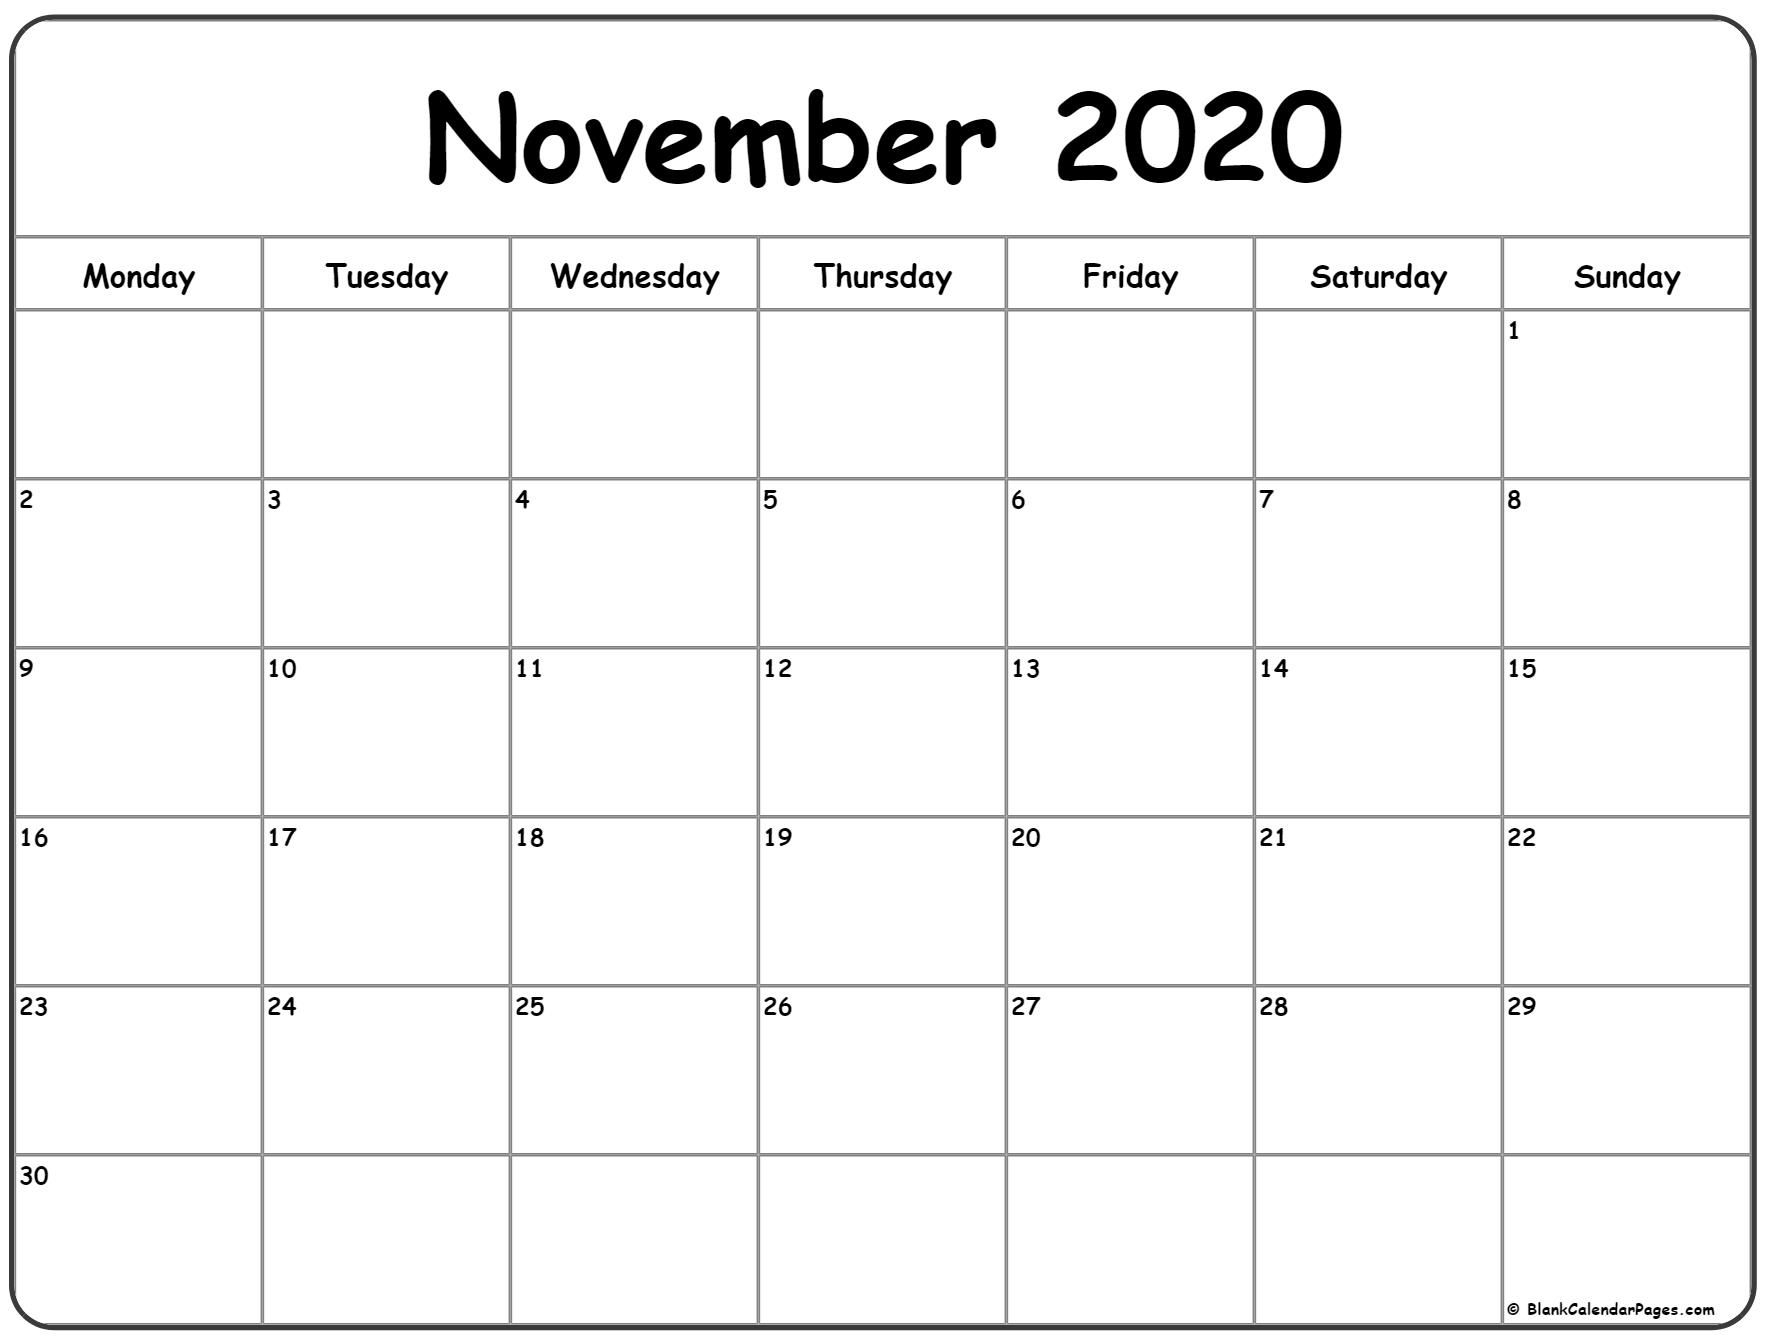 November 2020 Monday Calendar | Monday To Sunday In 2020